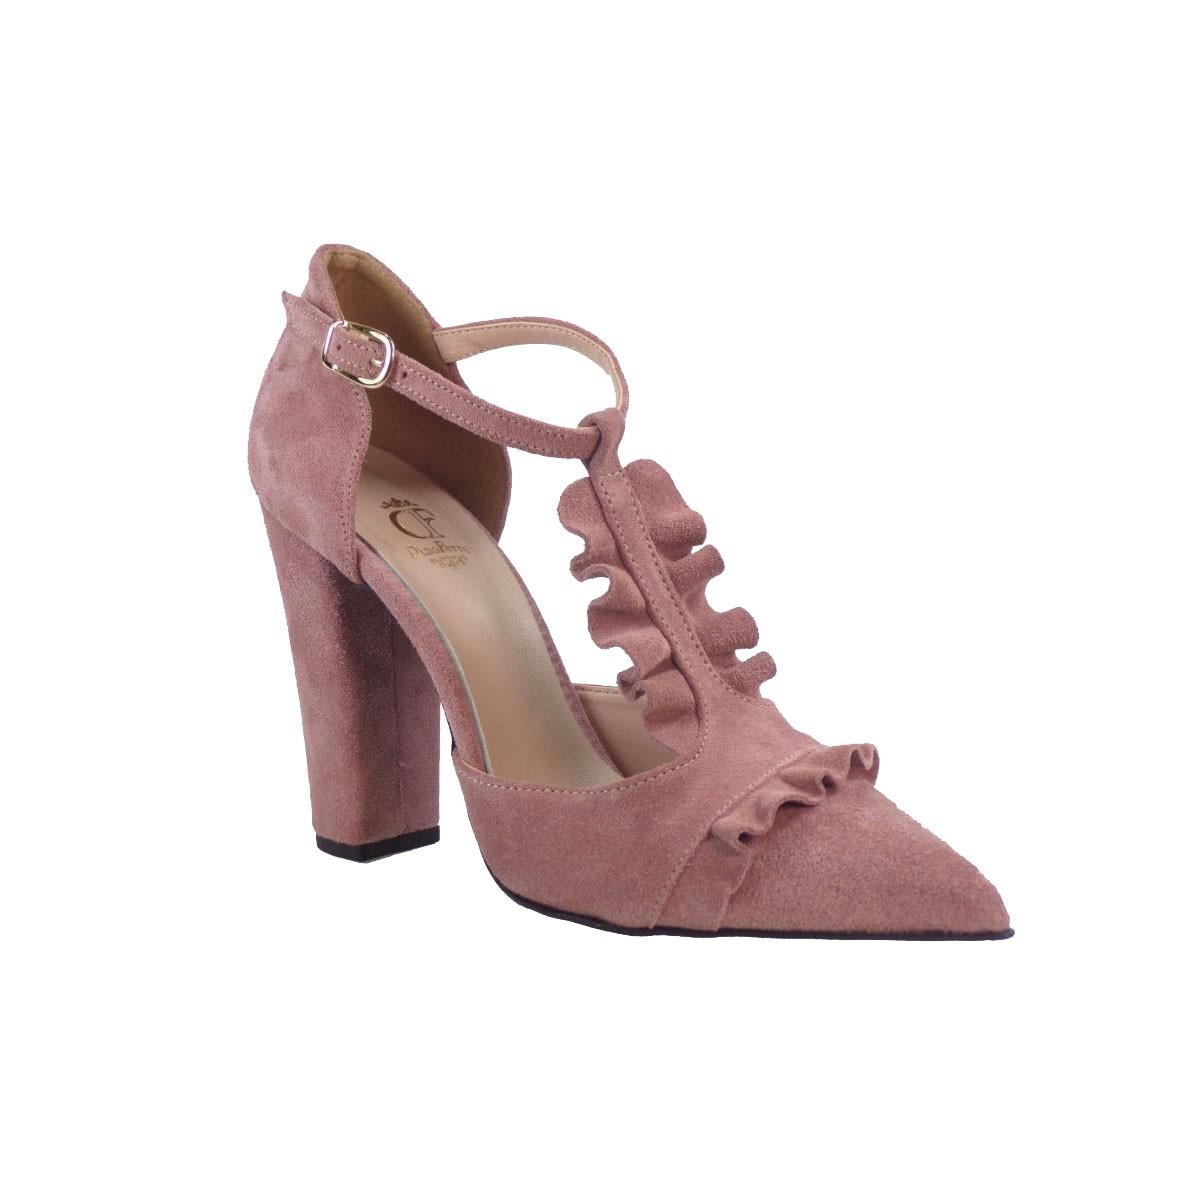 SMART CRONOS Γυναικεία Παπούτσια Γόβες 6709/1787 Πούδρα Δέρμα Καστόρι